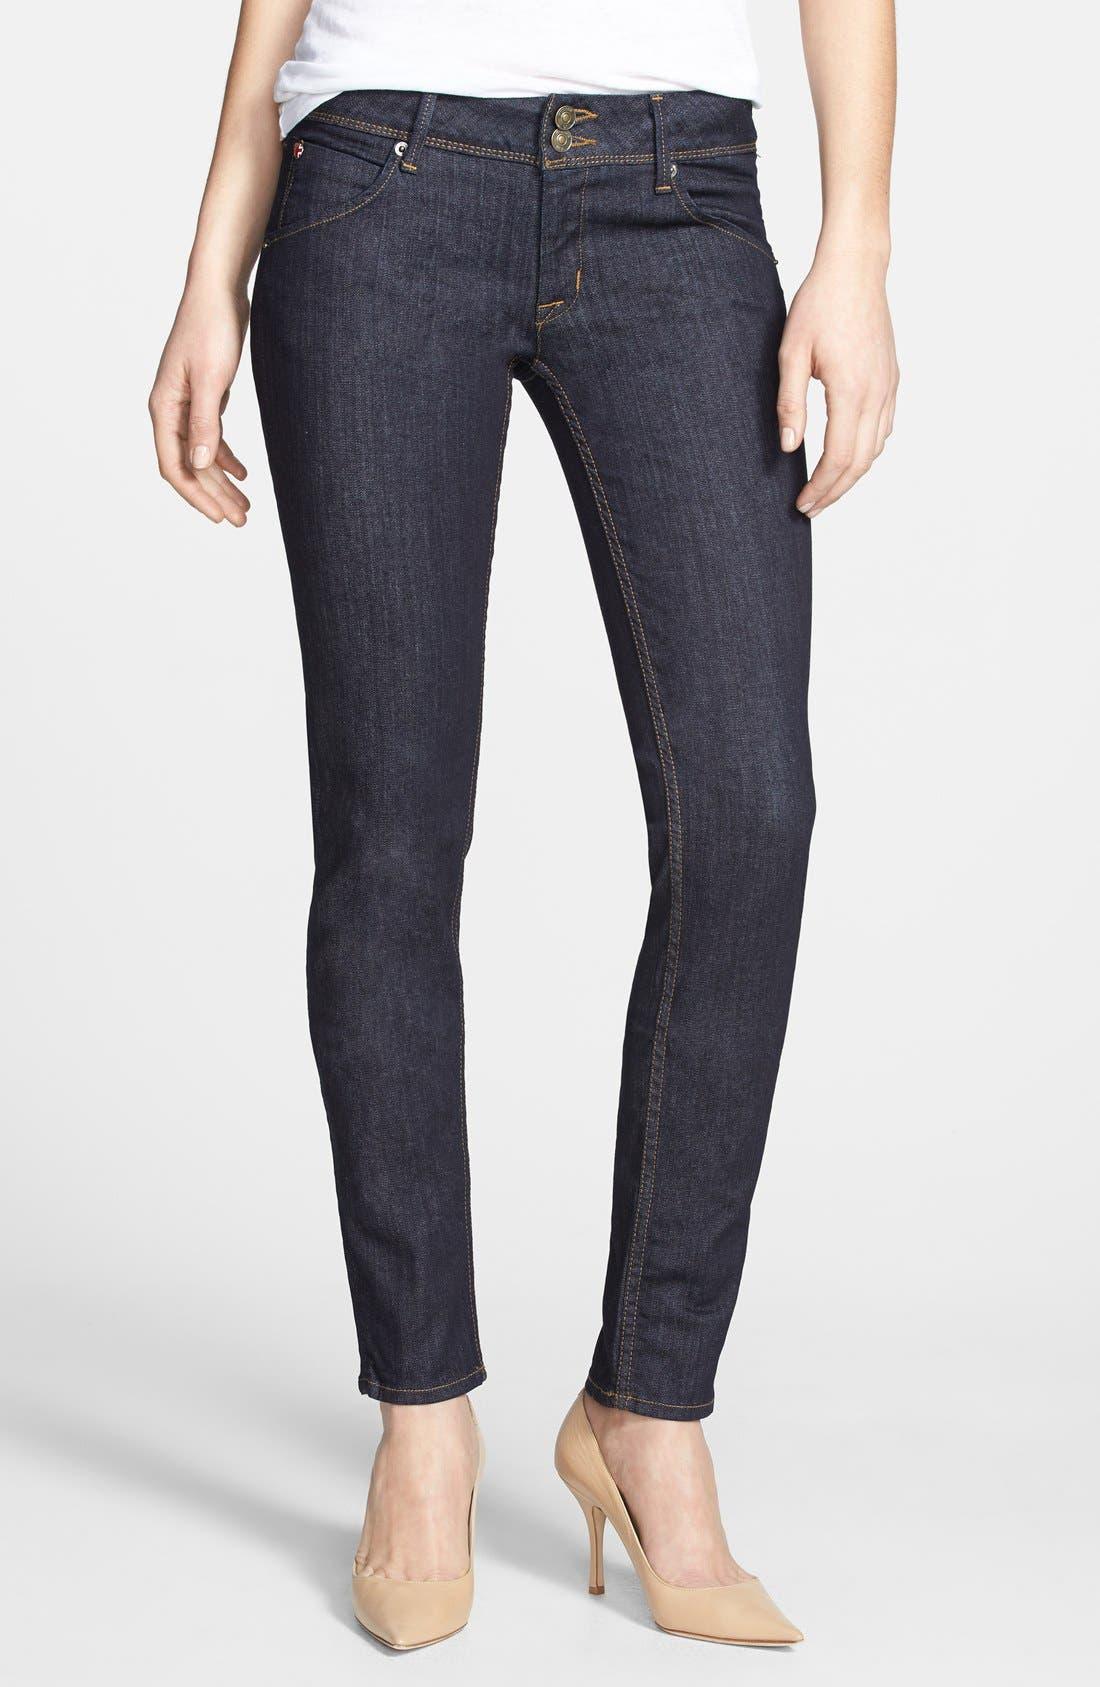 Alternate Image 1 Selected - Hudson Jeans 'Collin' Skinny Jeans (Foley)